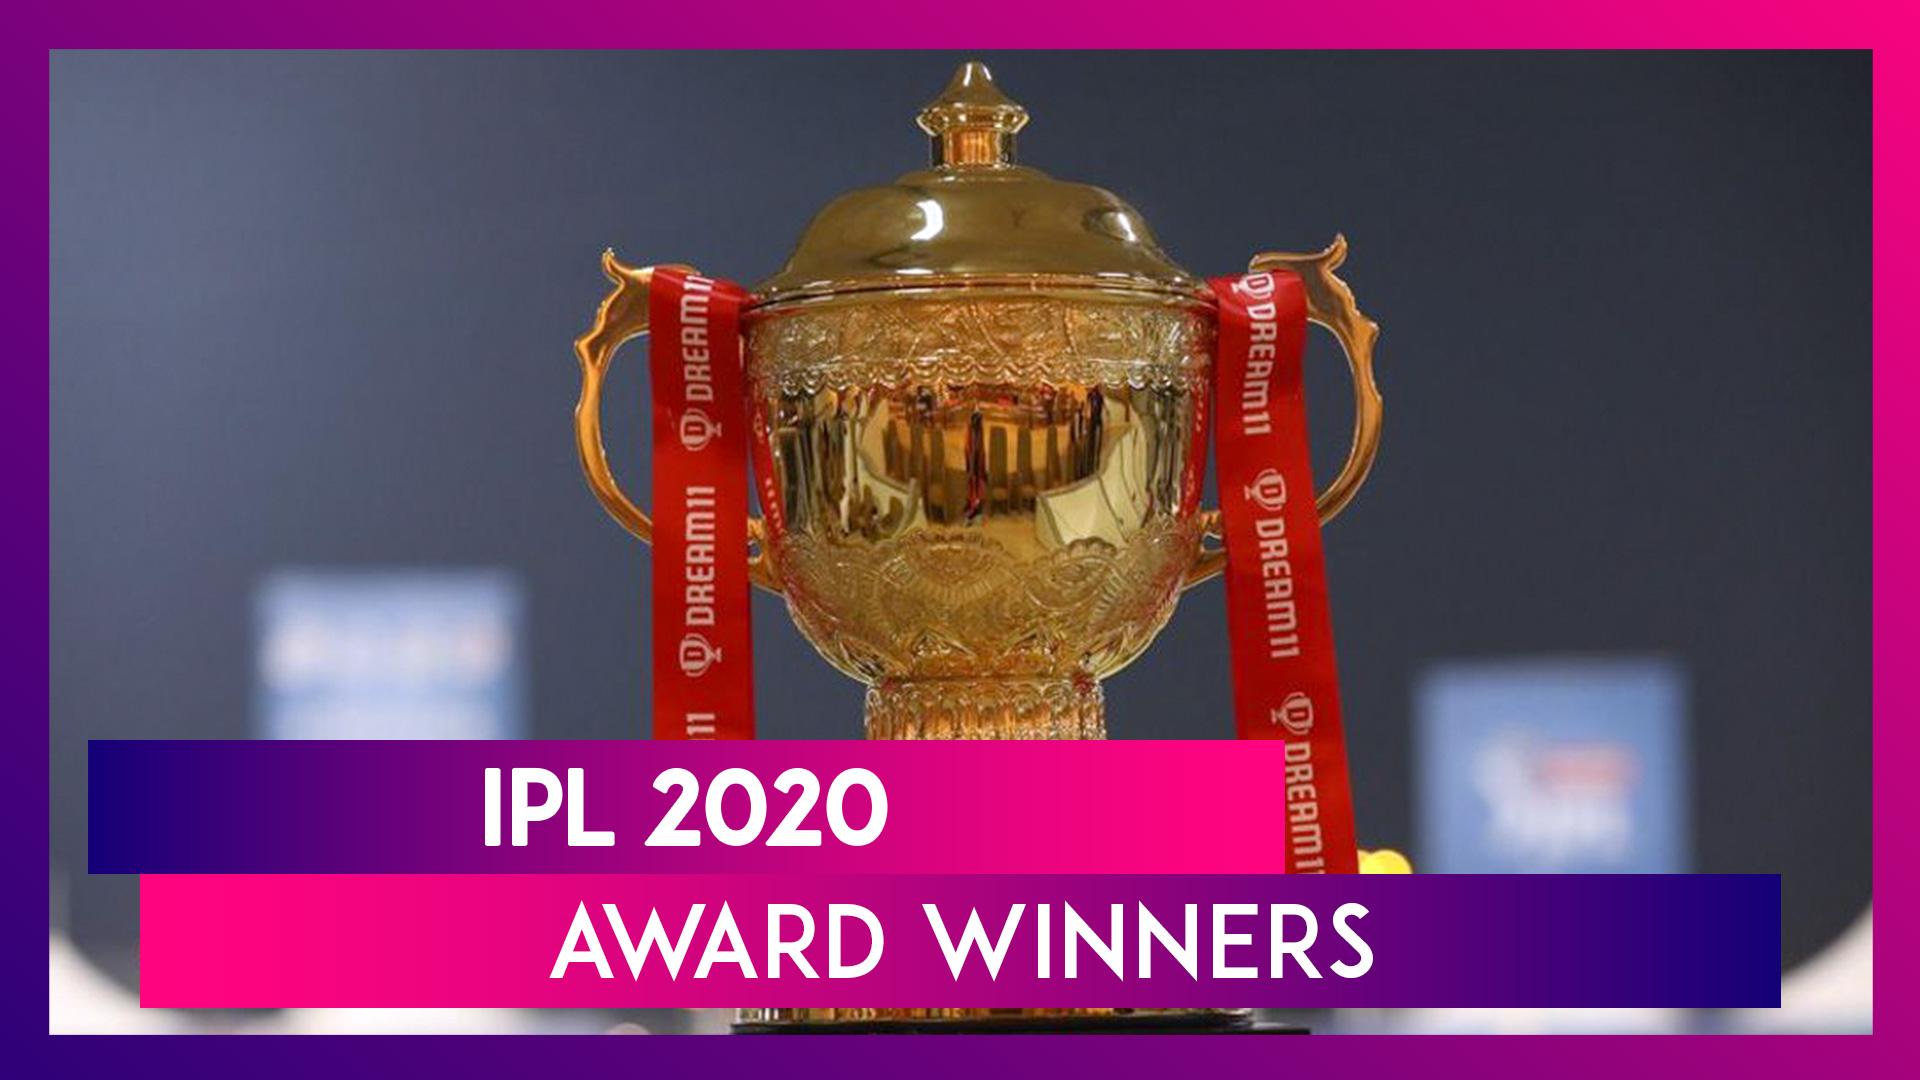 IPL 2020 Awards: MVP, Orange Cap, Purple Cap; Check Full Winners List